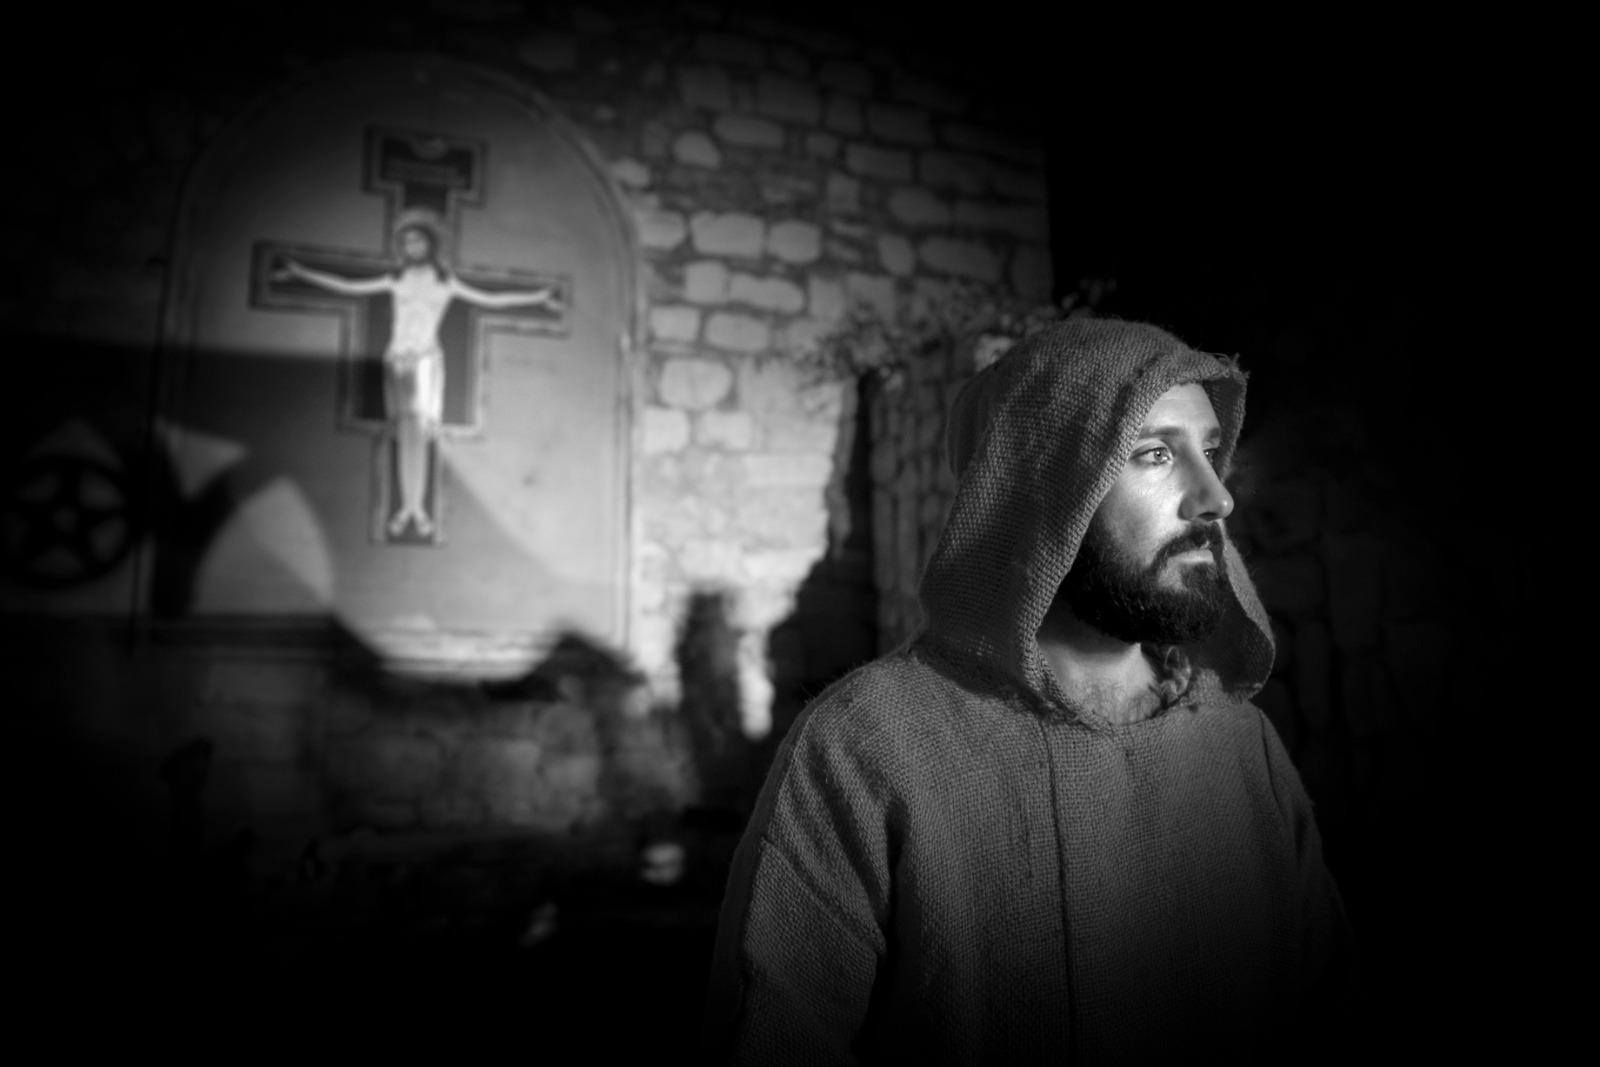 Gangi, sta tornando Vivere in Assisi